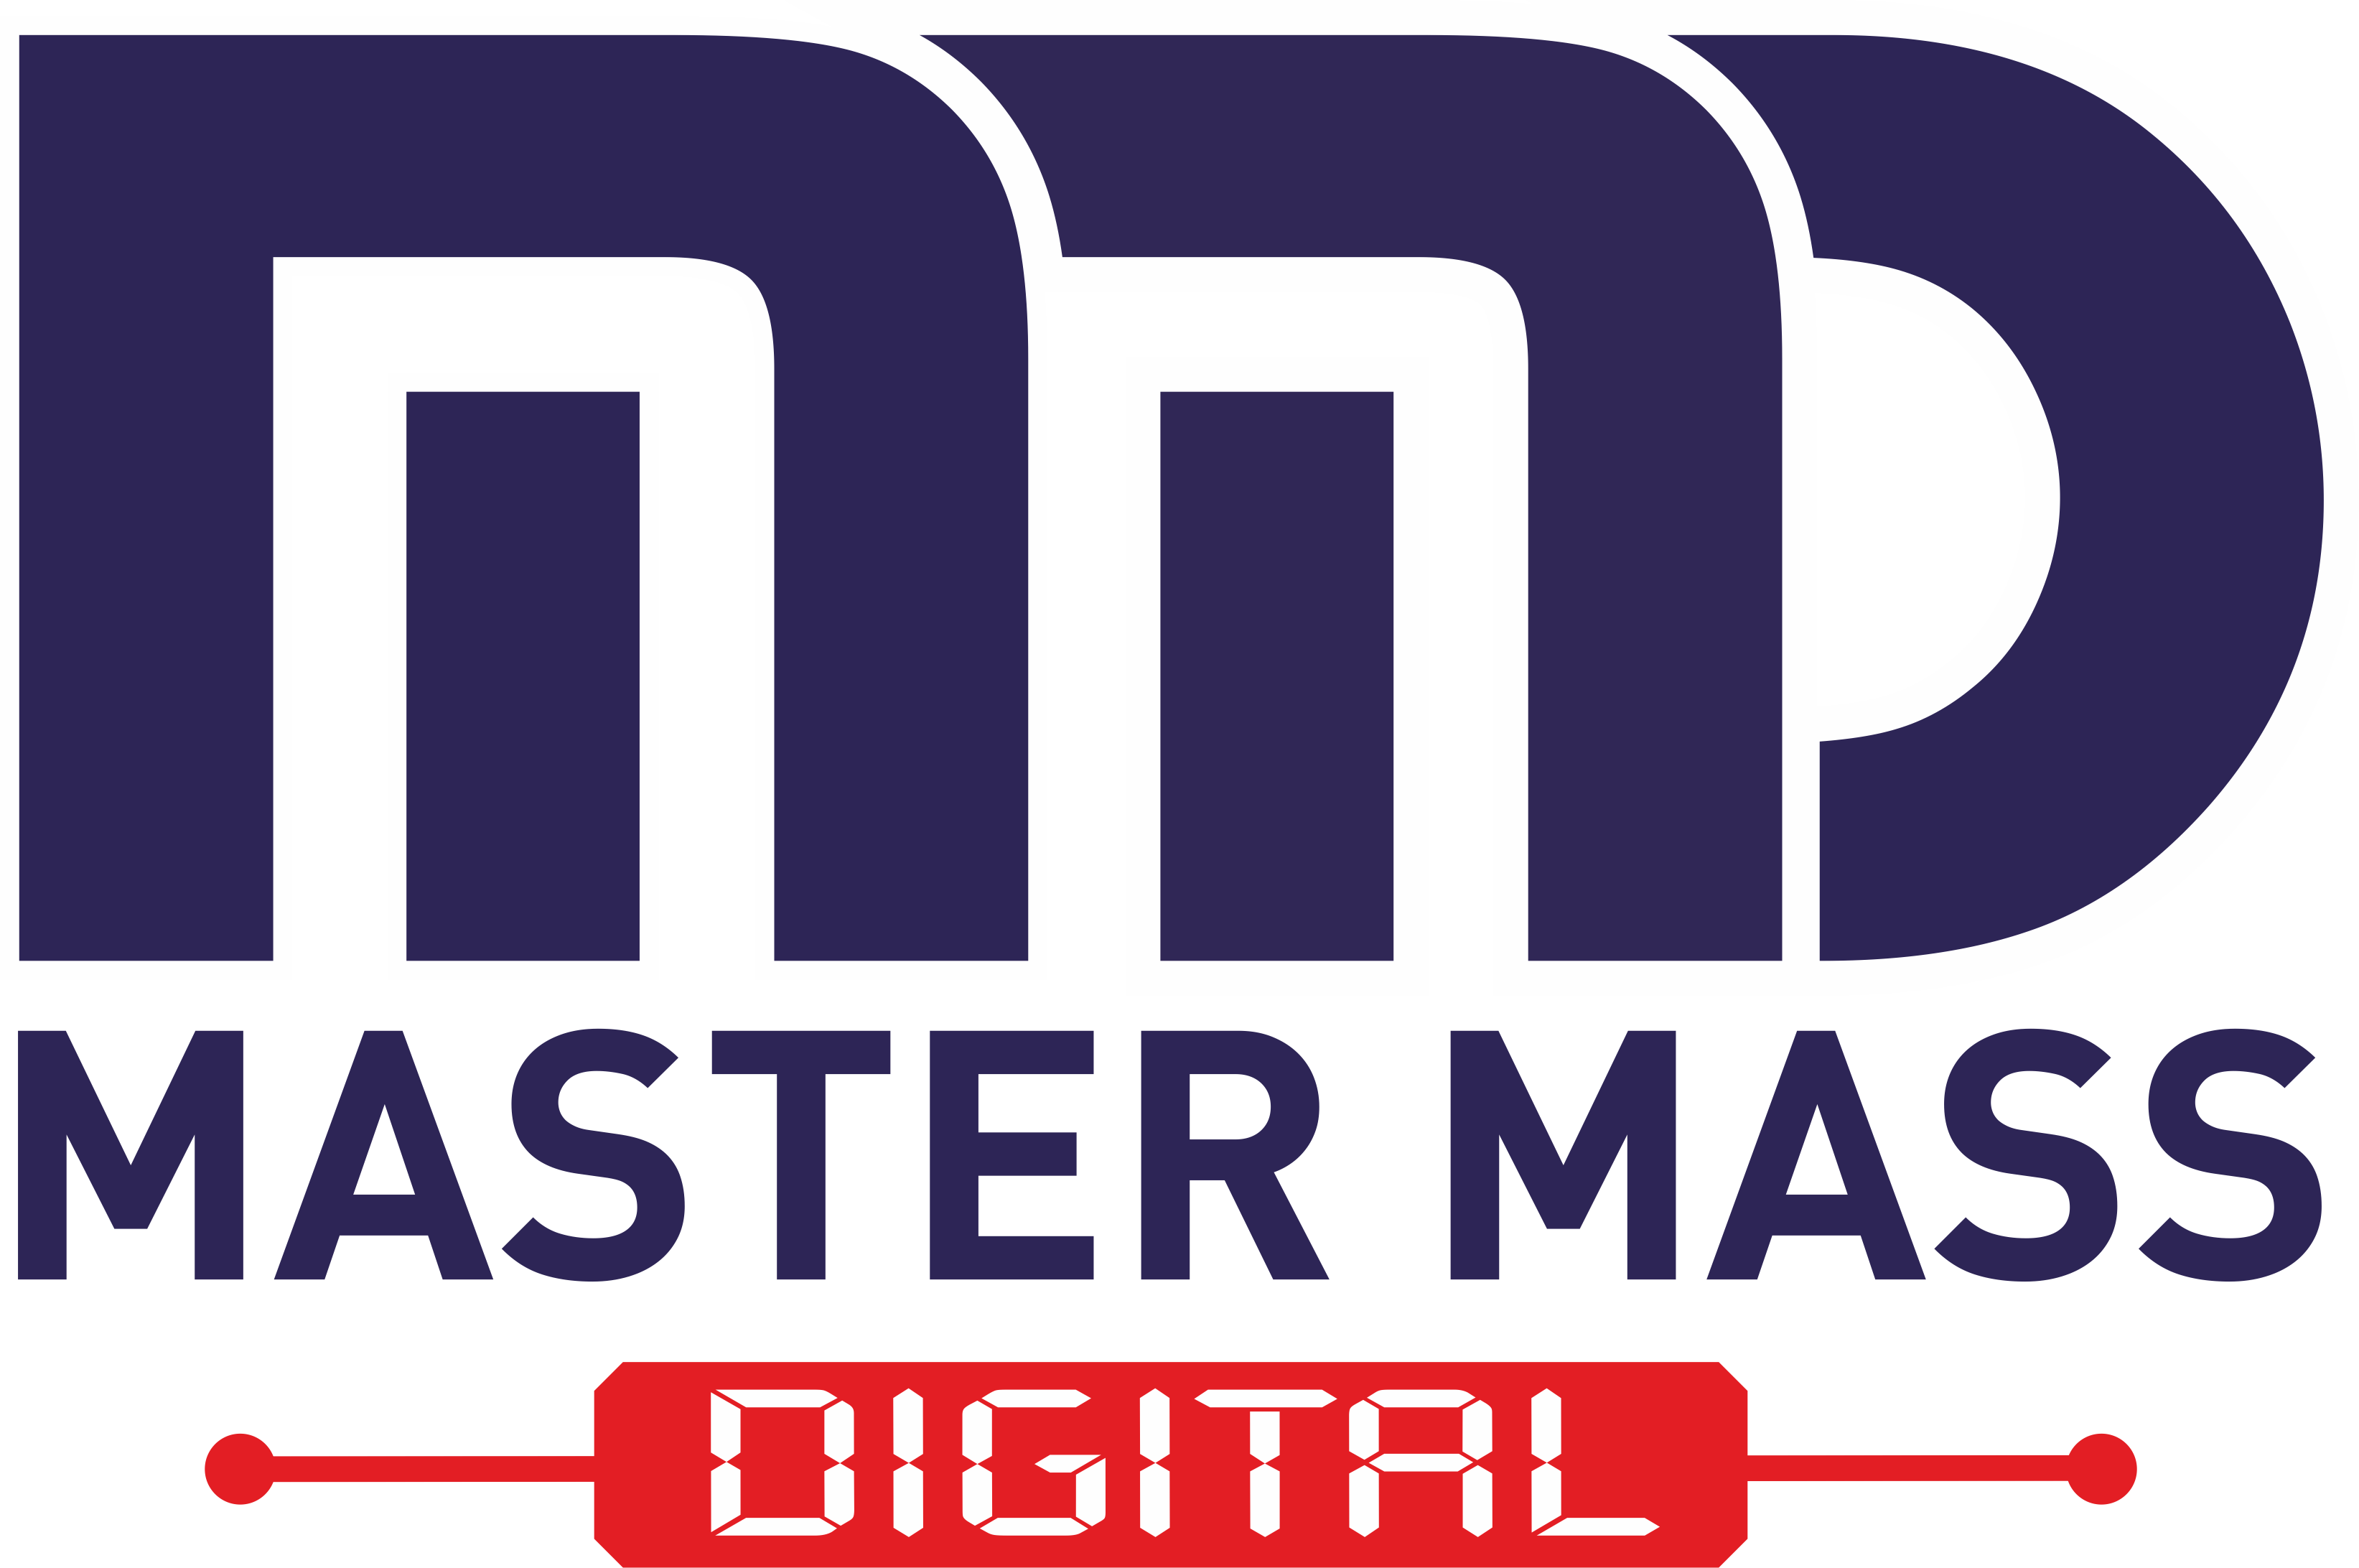 Master Mass Digital